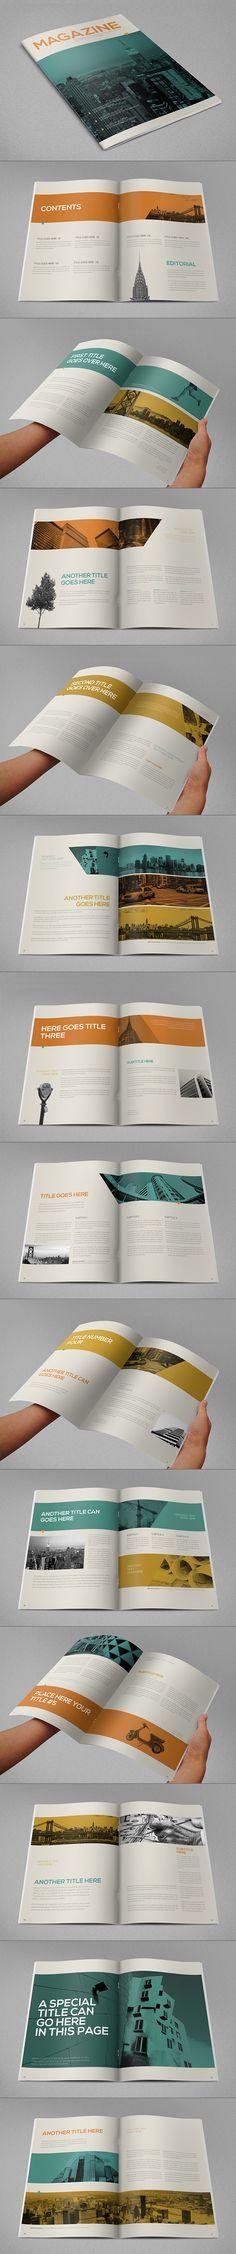 Cool Vintage Magazine. Download here: http://graphicriver.net/item/cool-vintage-magazine/11294257?ref=abradesign #magazine  #design